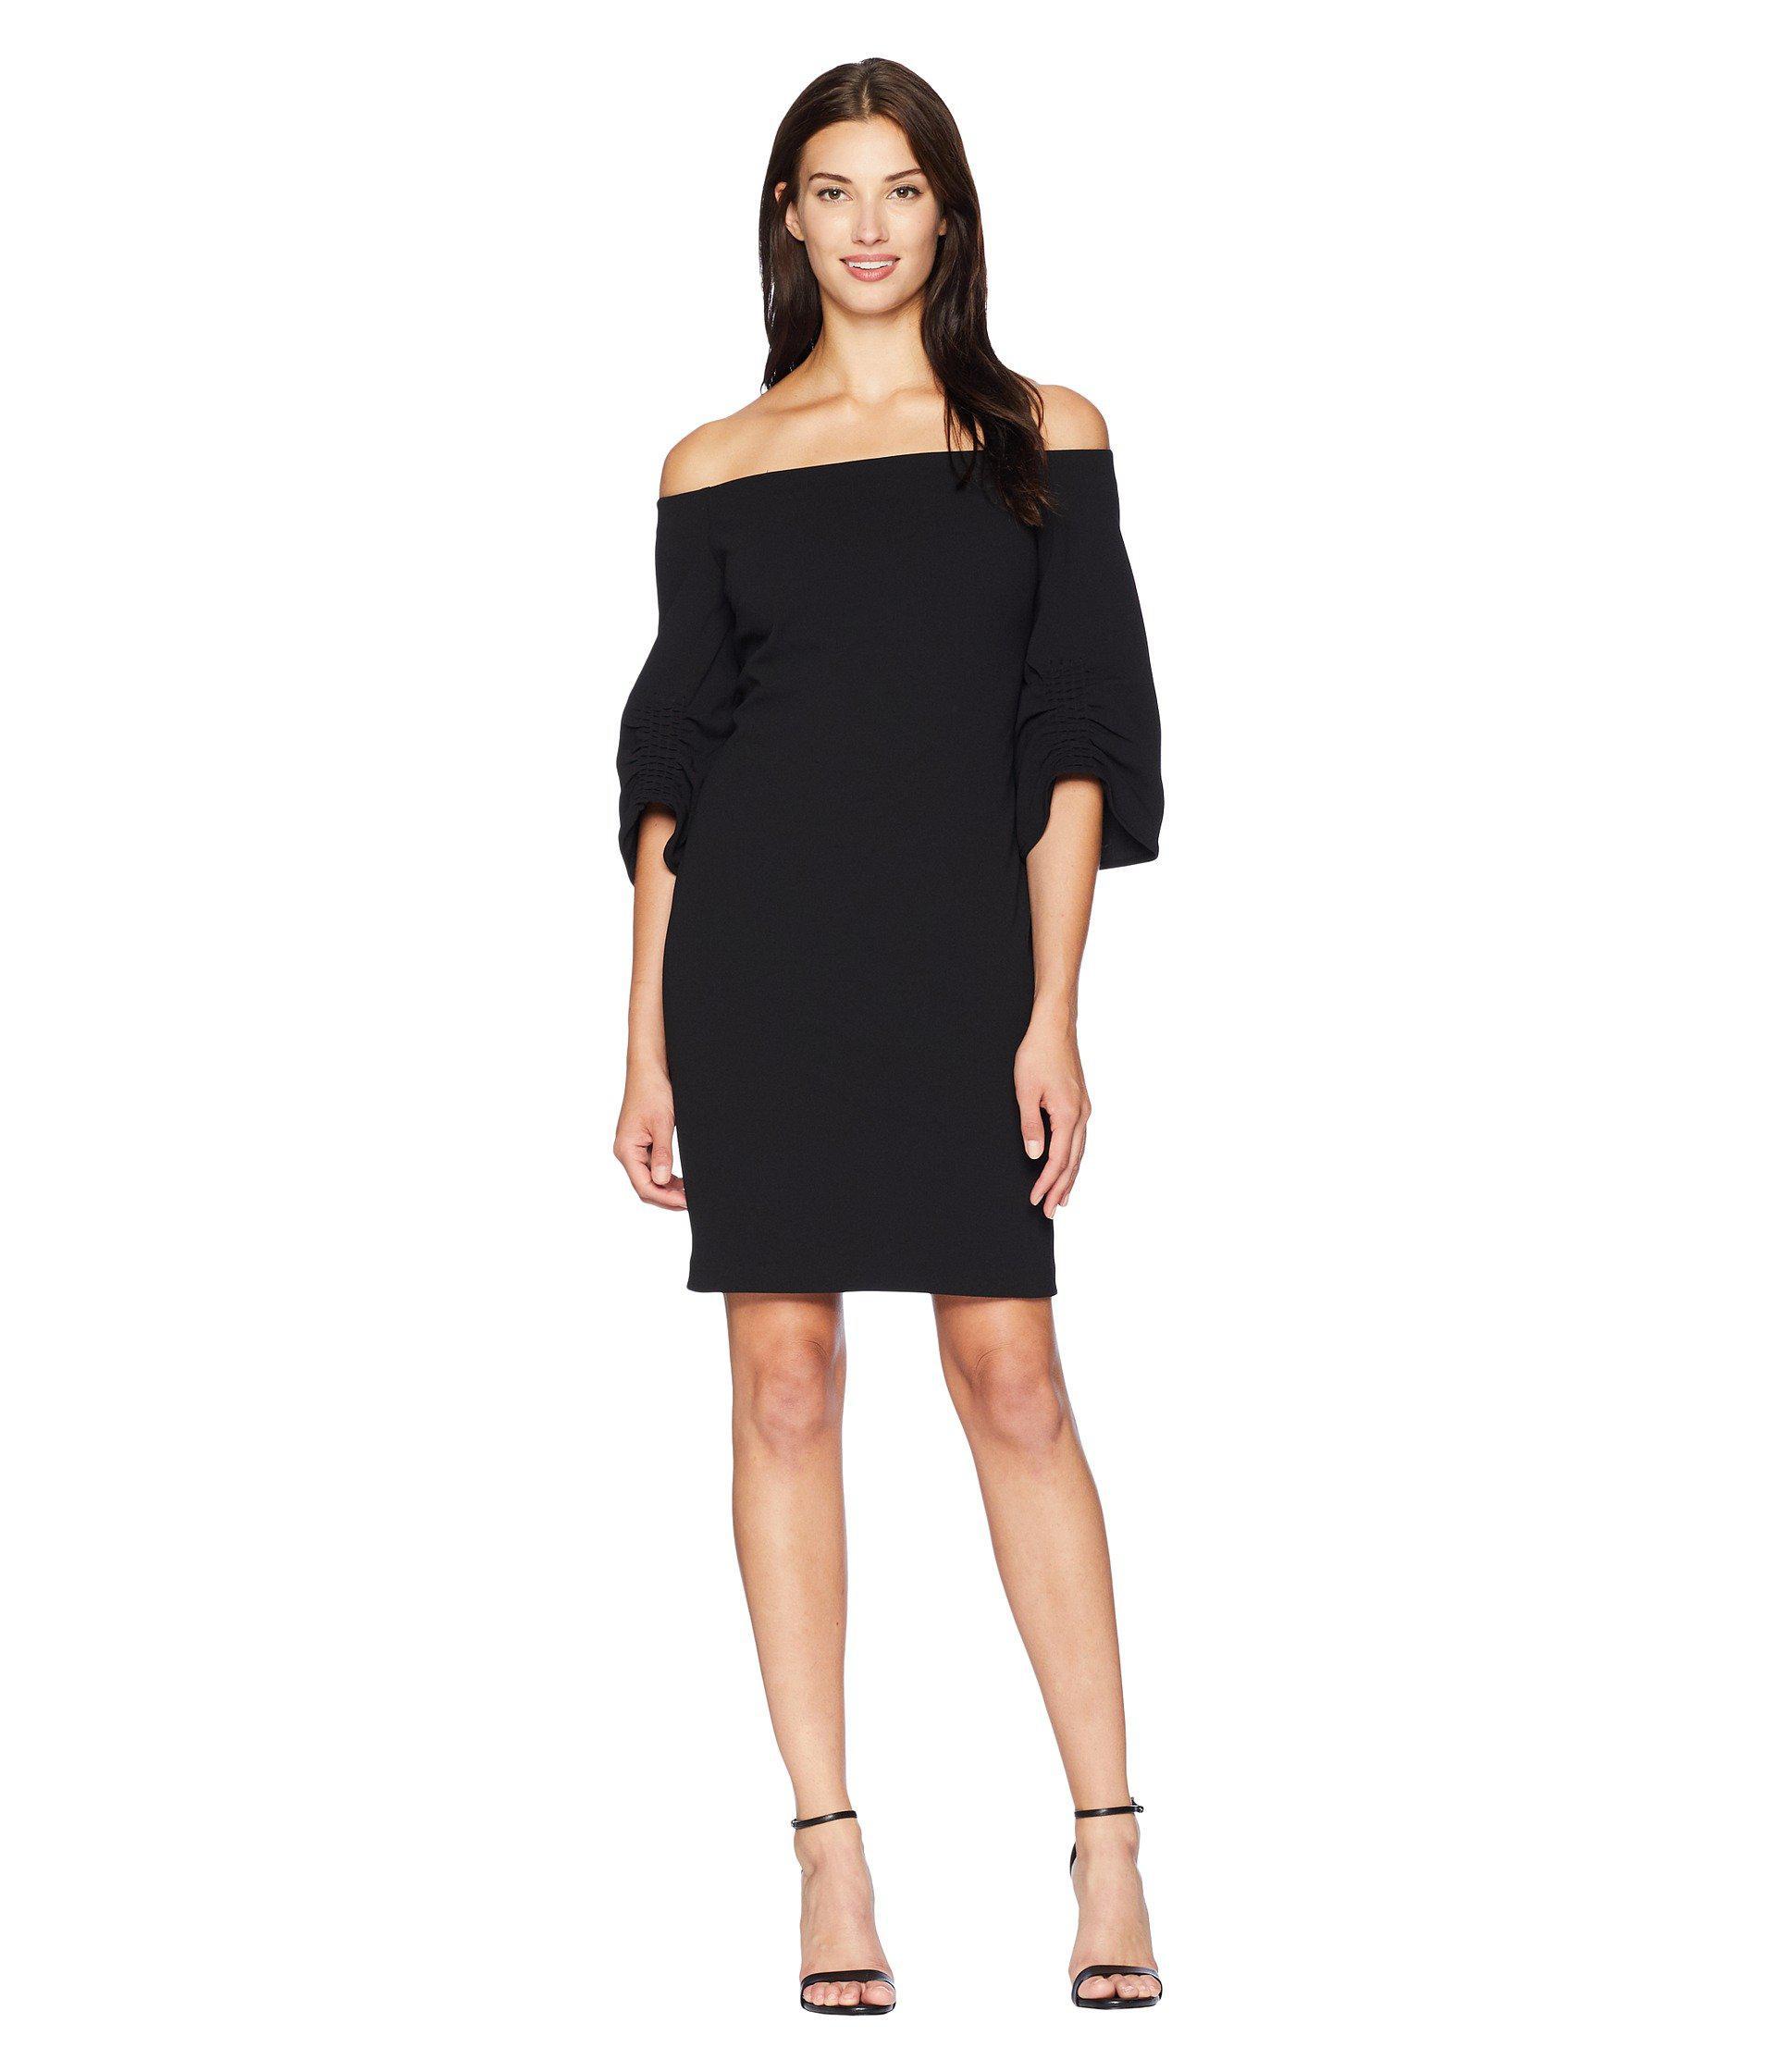 c802d493e6 Vince Camuto. Women s Black Off The Shoulder Cinched Sleeve Sheath Dress ...